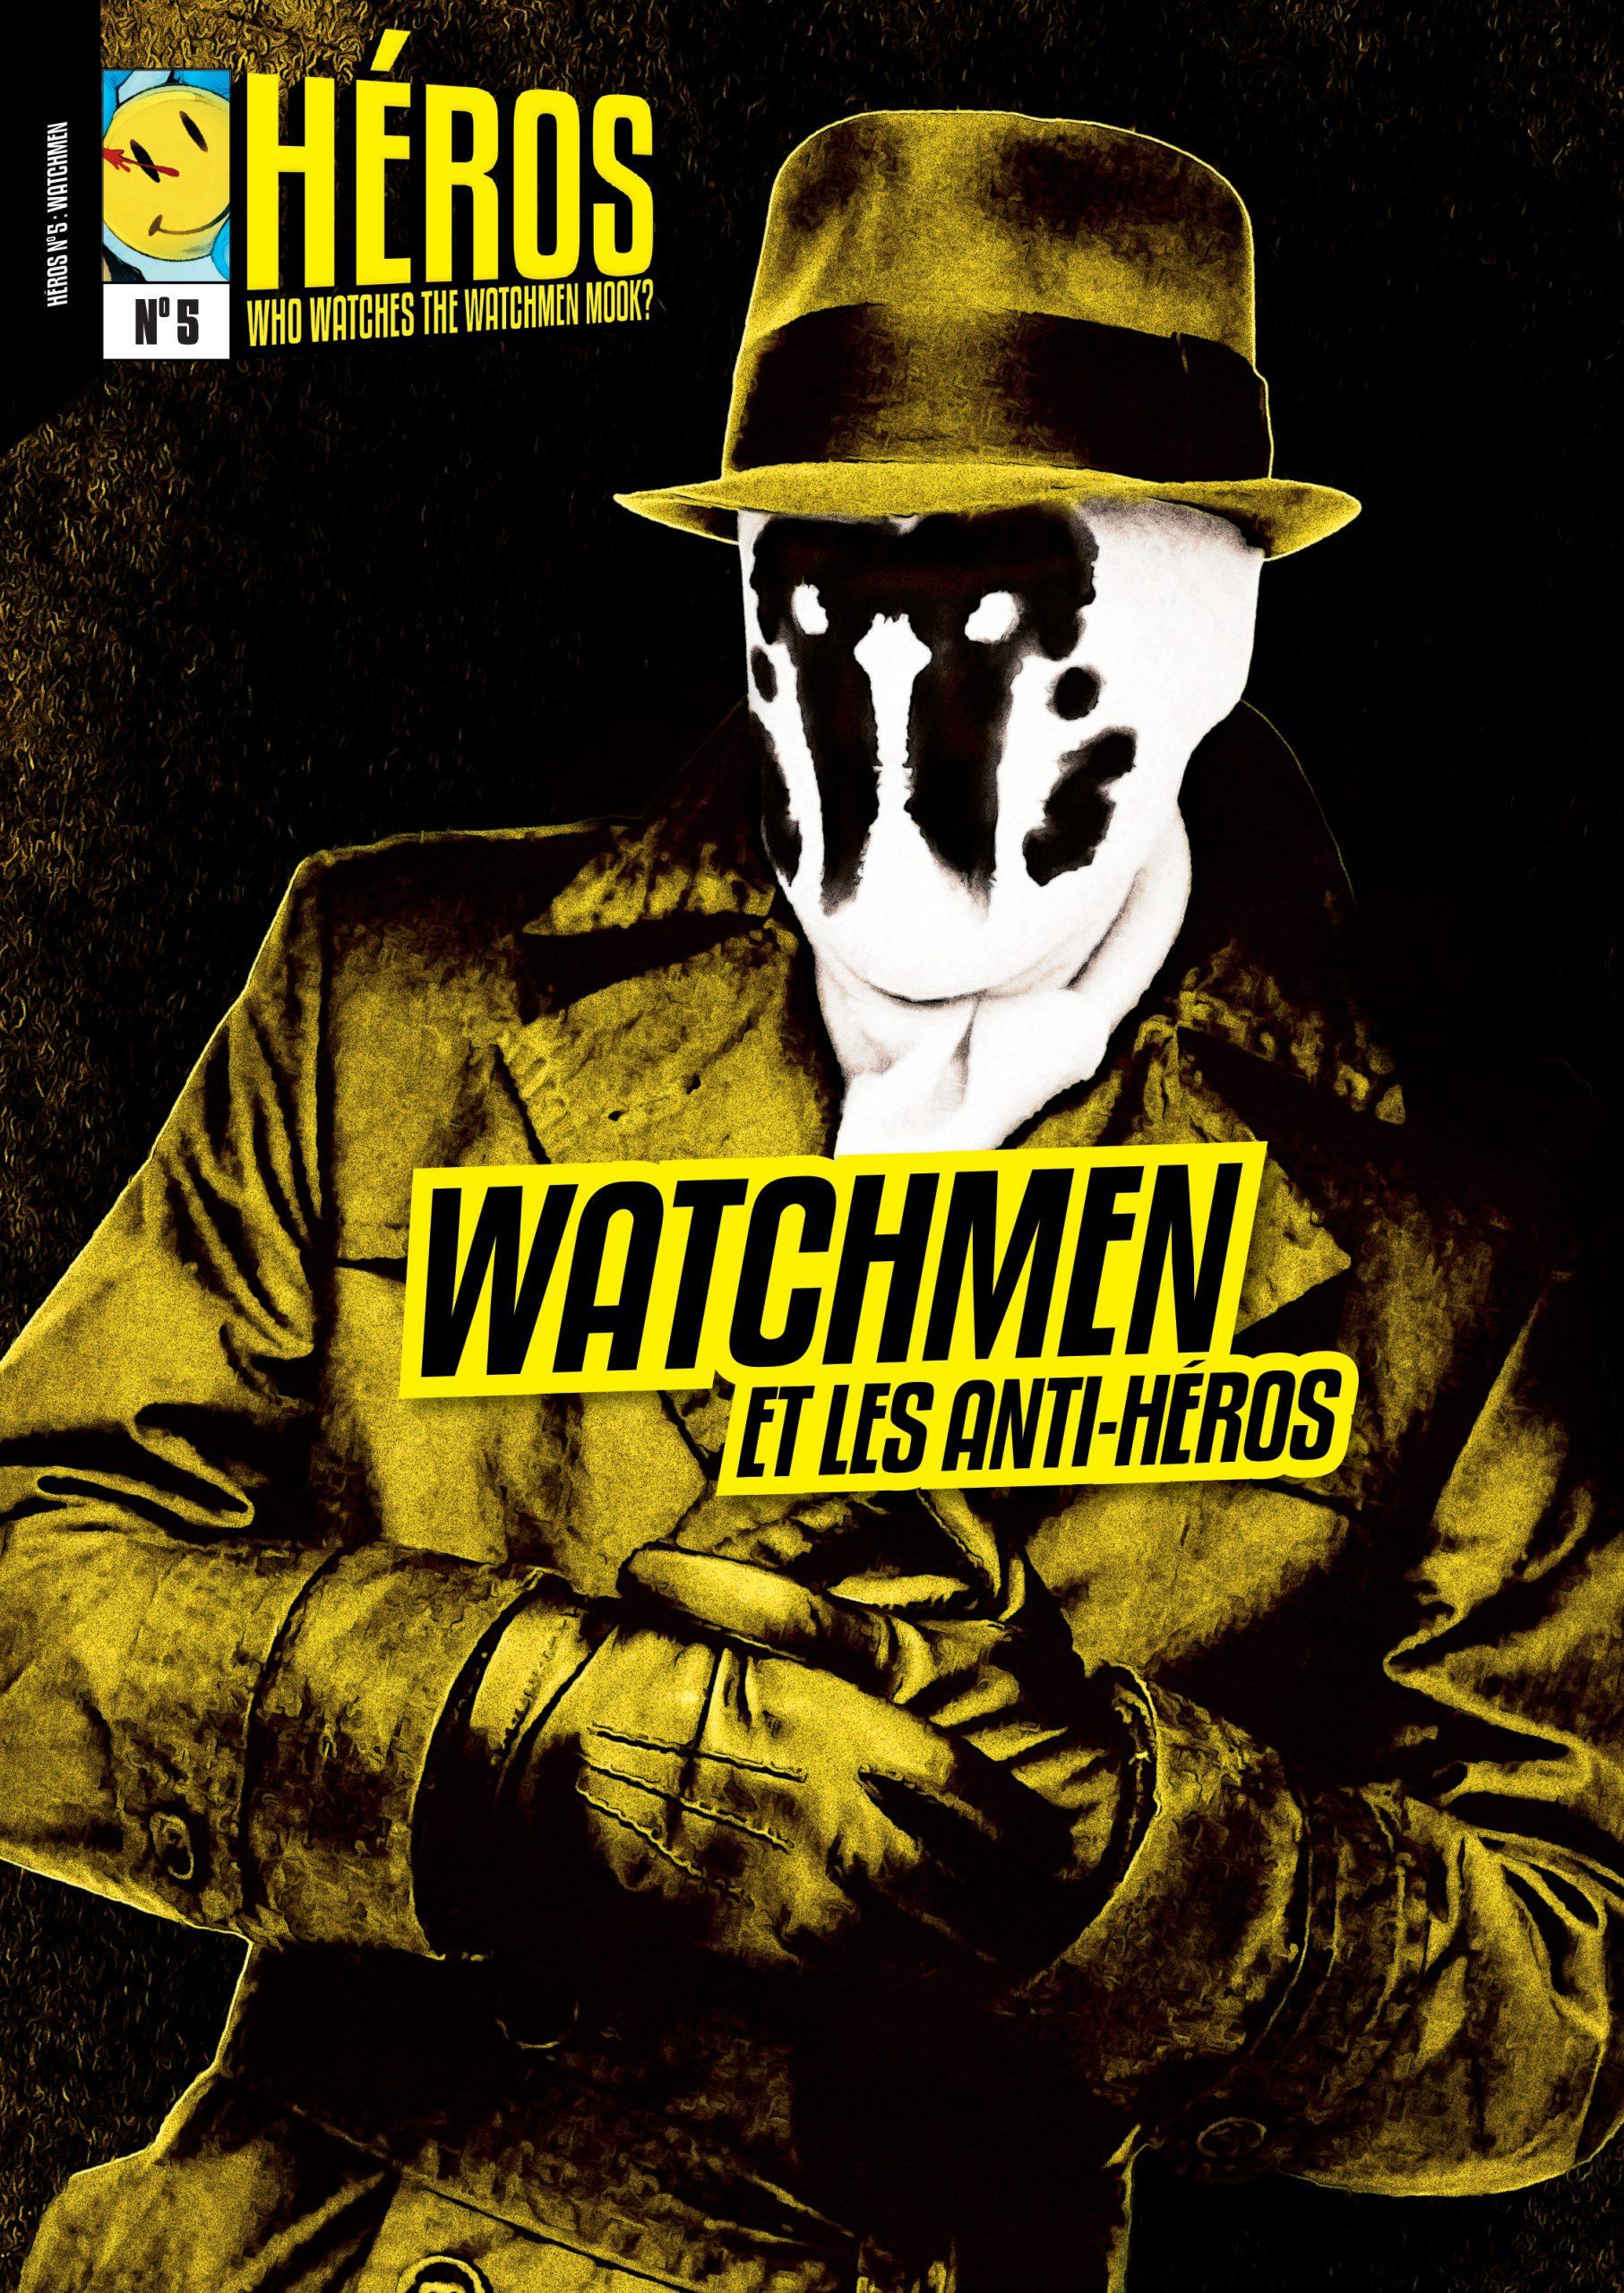 Héros5_watchmen_C1